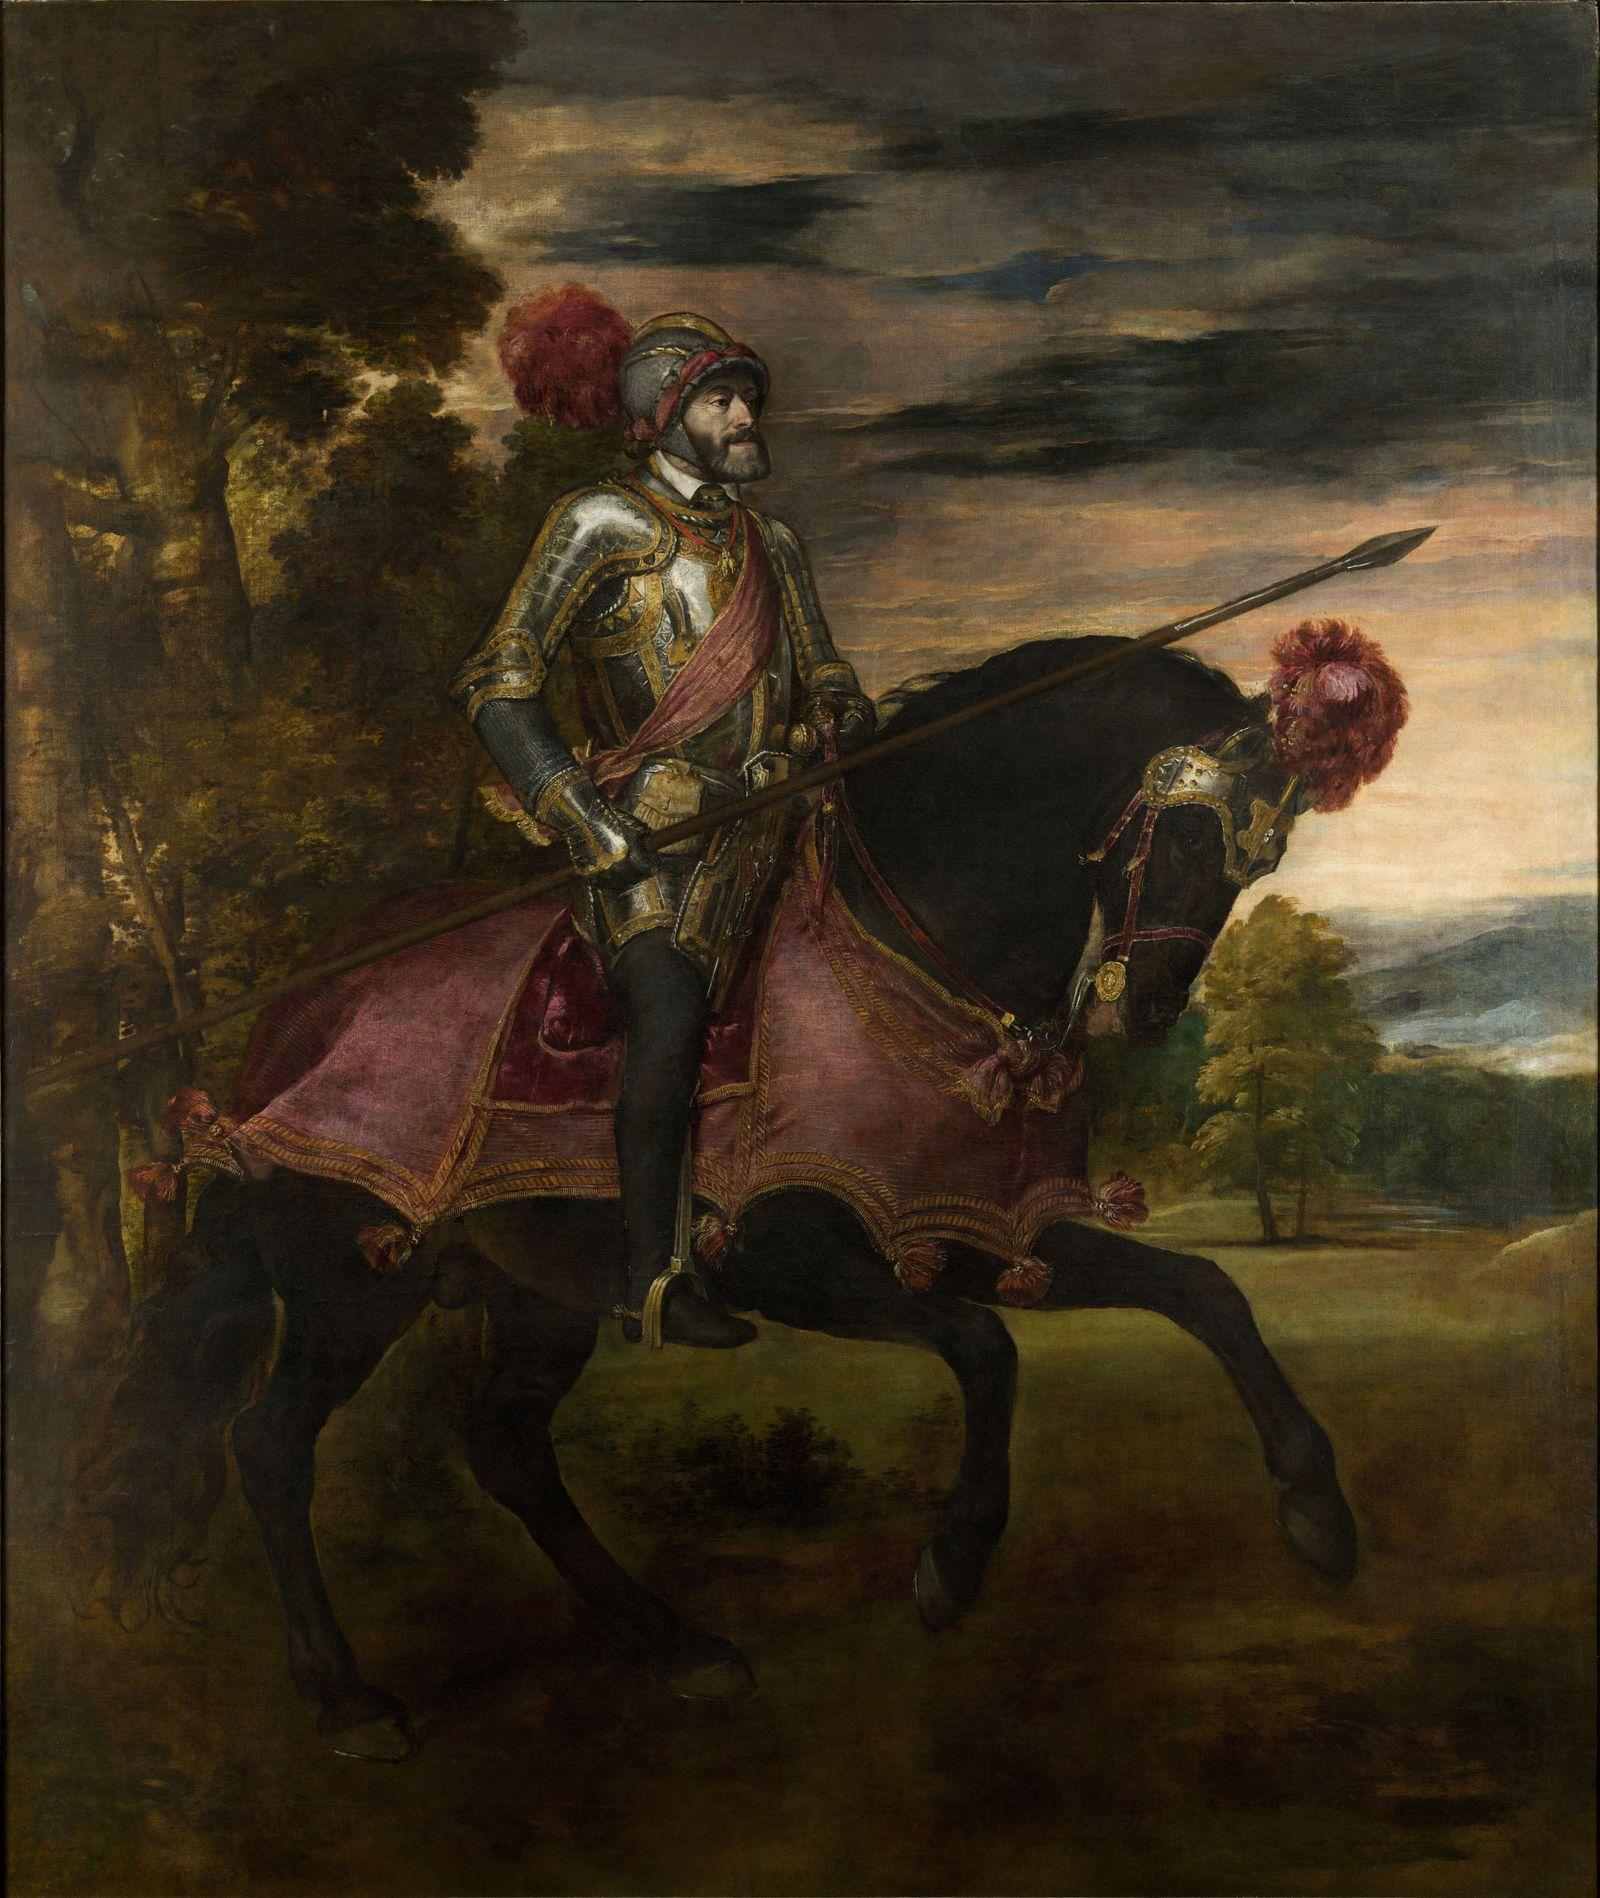 Equestrian Portrait of Charles V of Spain (1500-1558), 1548. Artist: Titian (1488-1576)